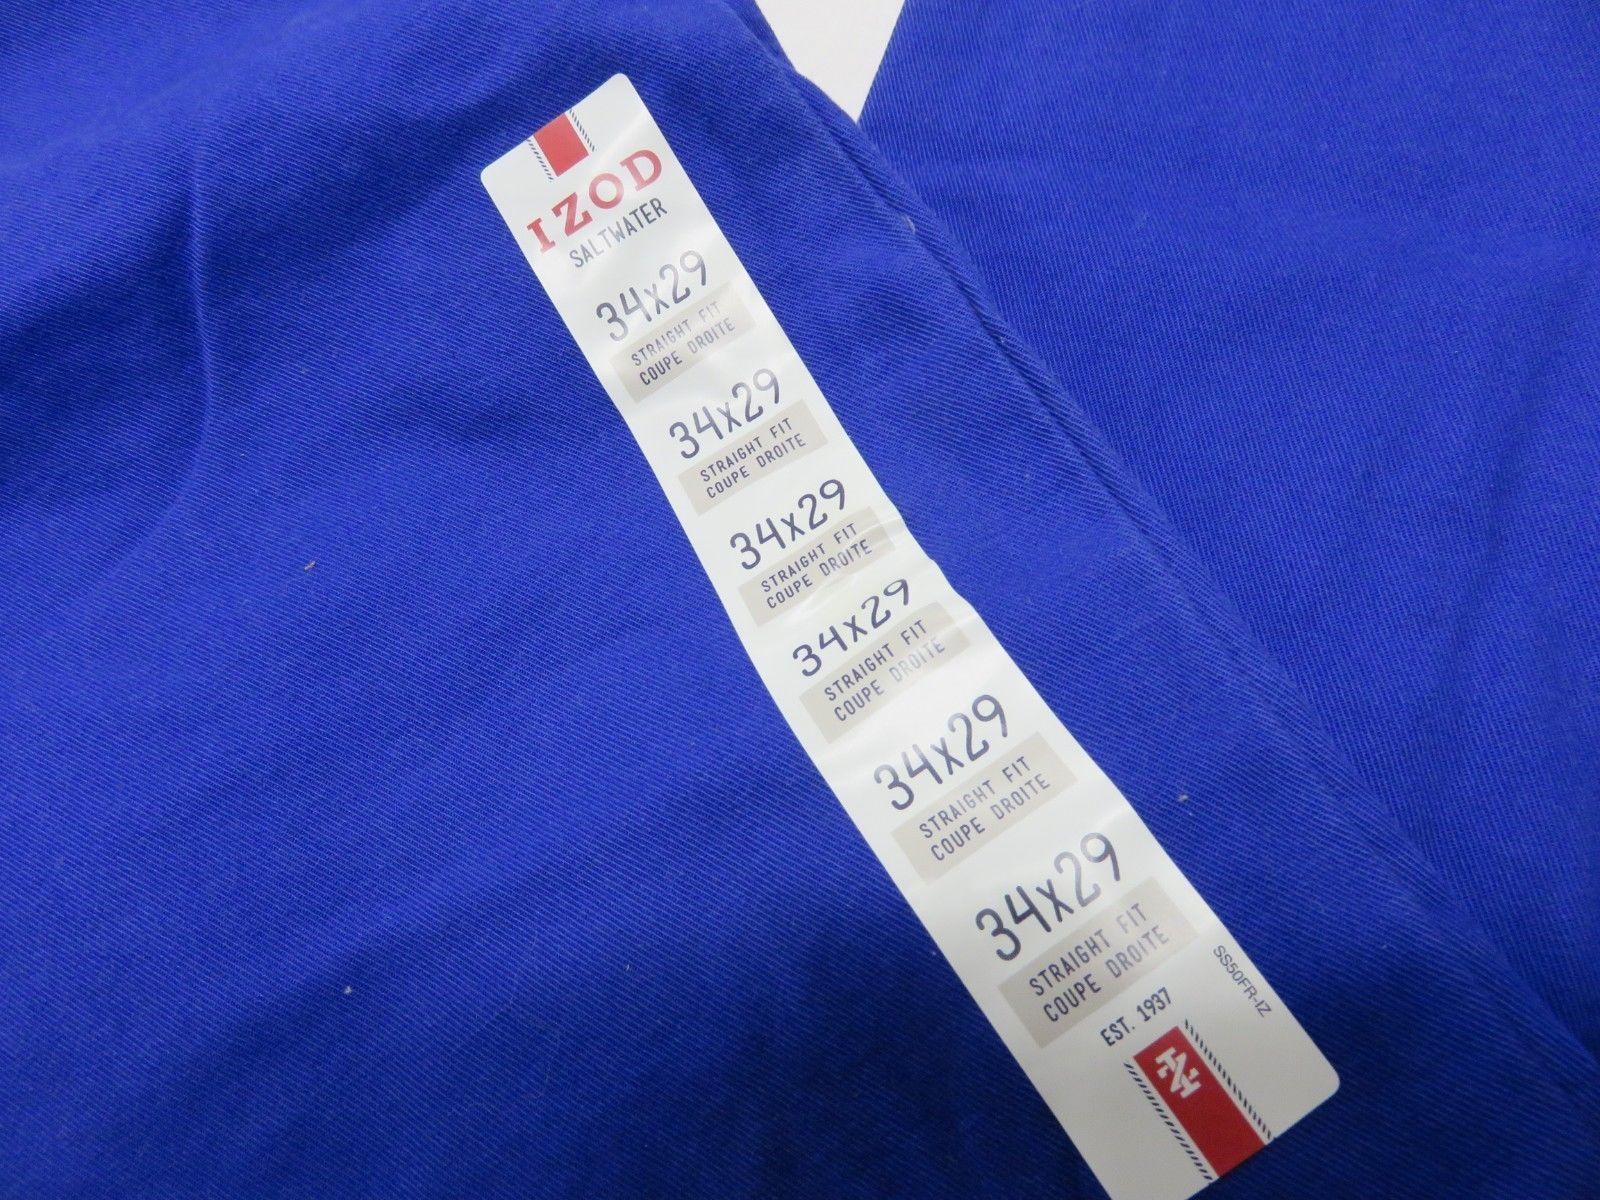 NOS w/ TAGS IZOD Saltwater Mazarine Blue Men's Straight Fit Pants Size W34 L29 image 2